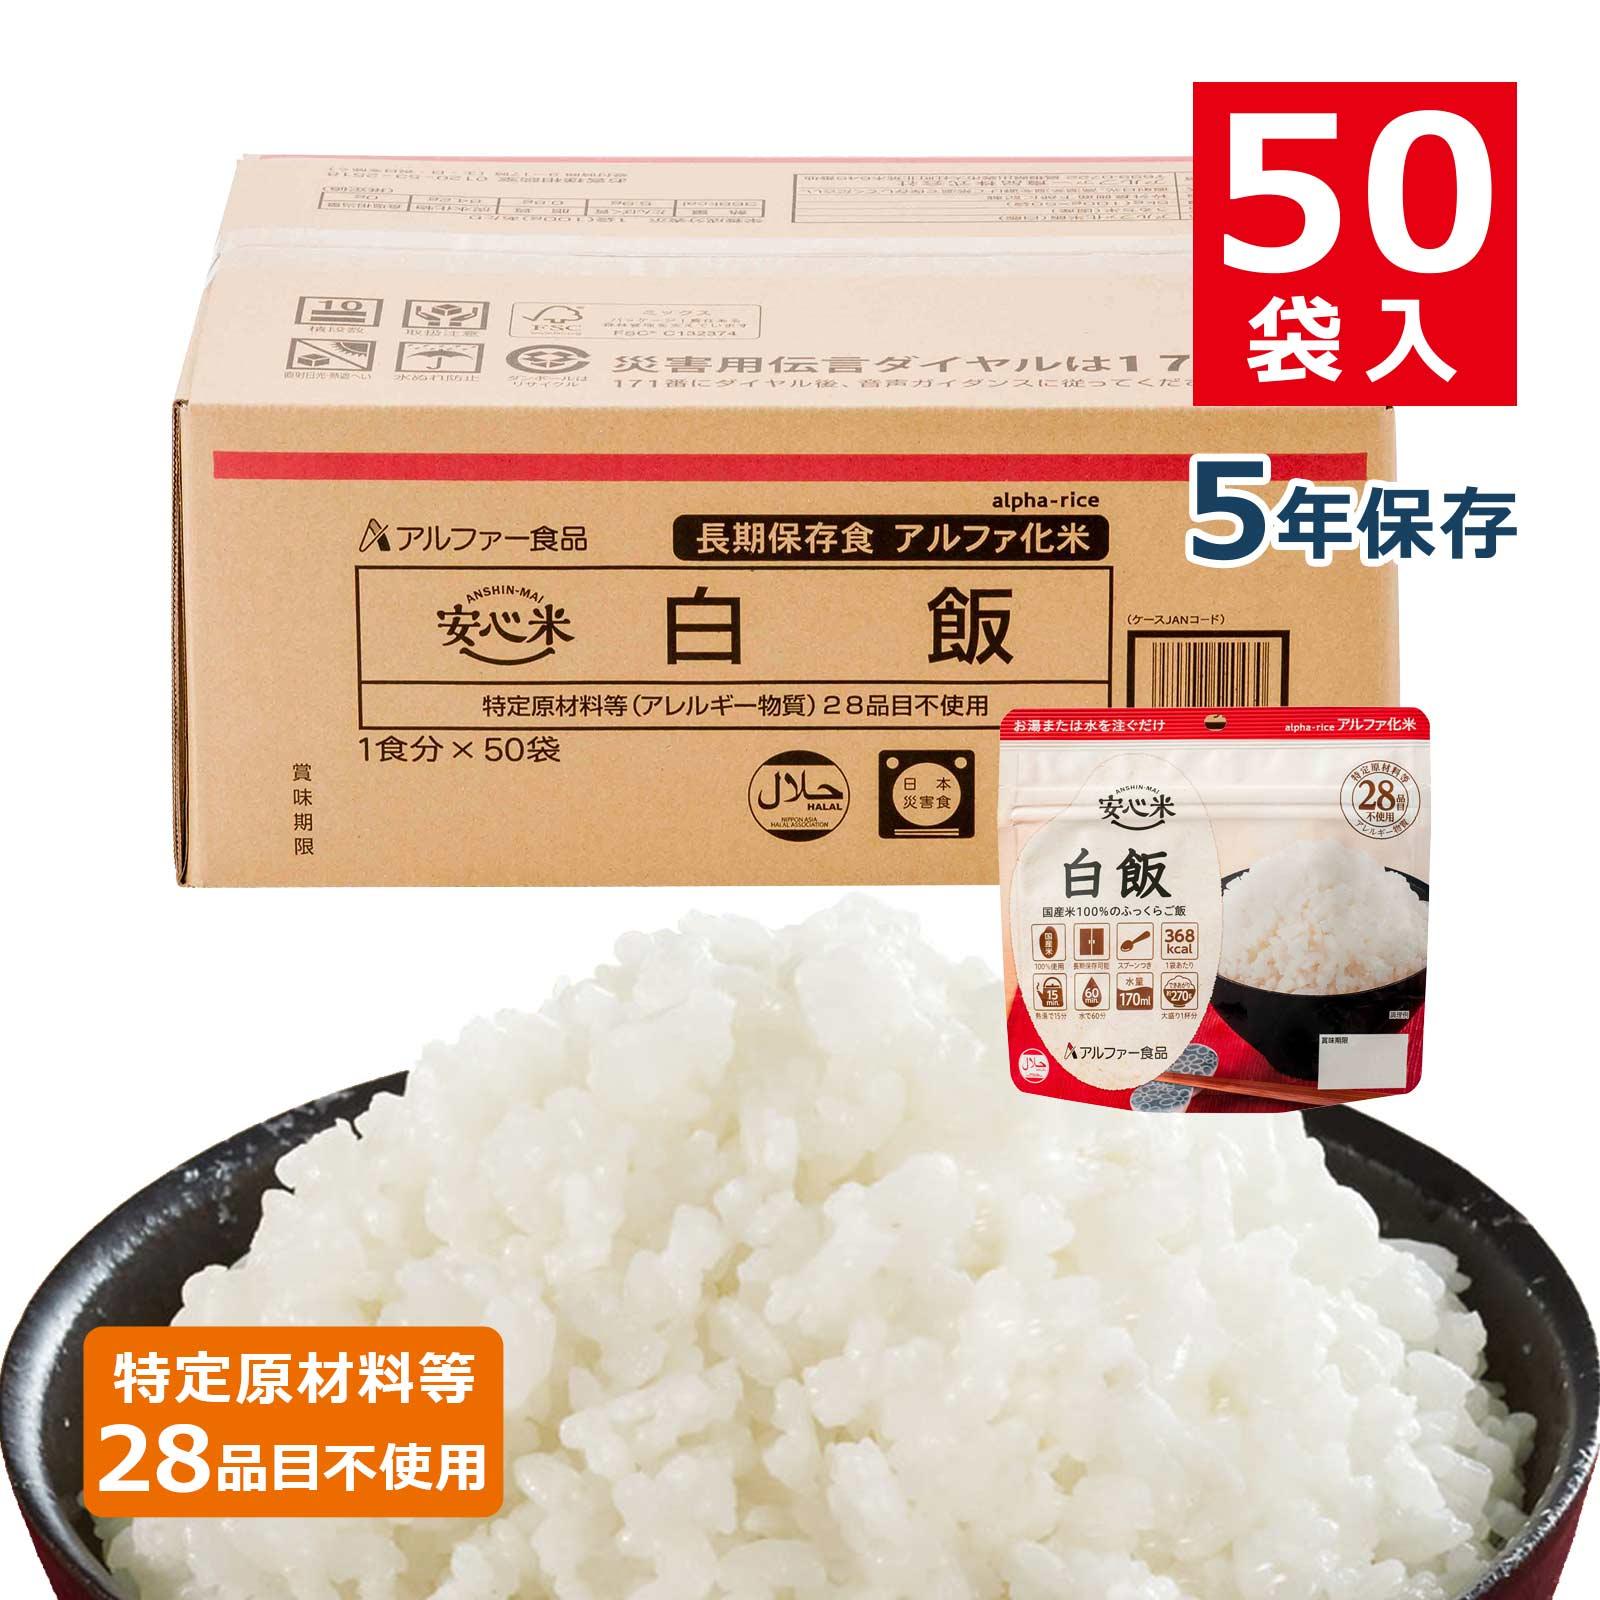 安心米(アルファ化米)個食 白飯 50袋入画像